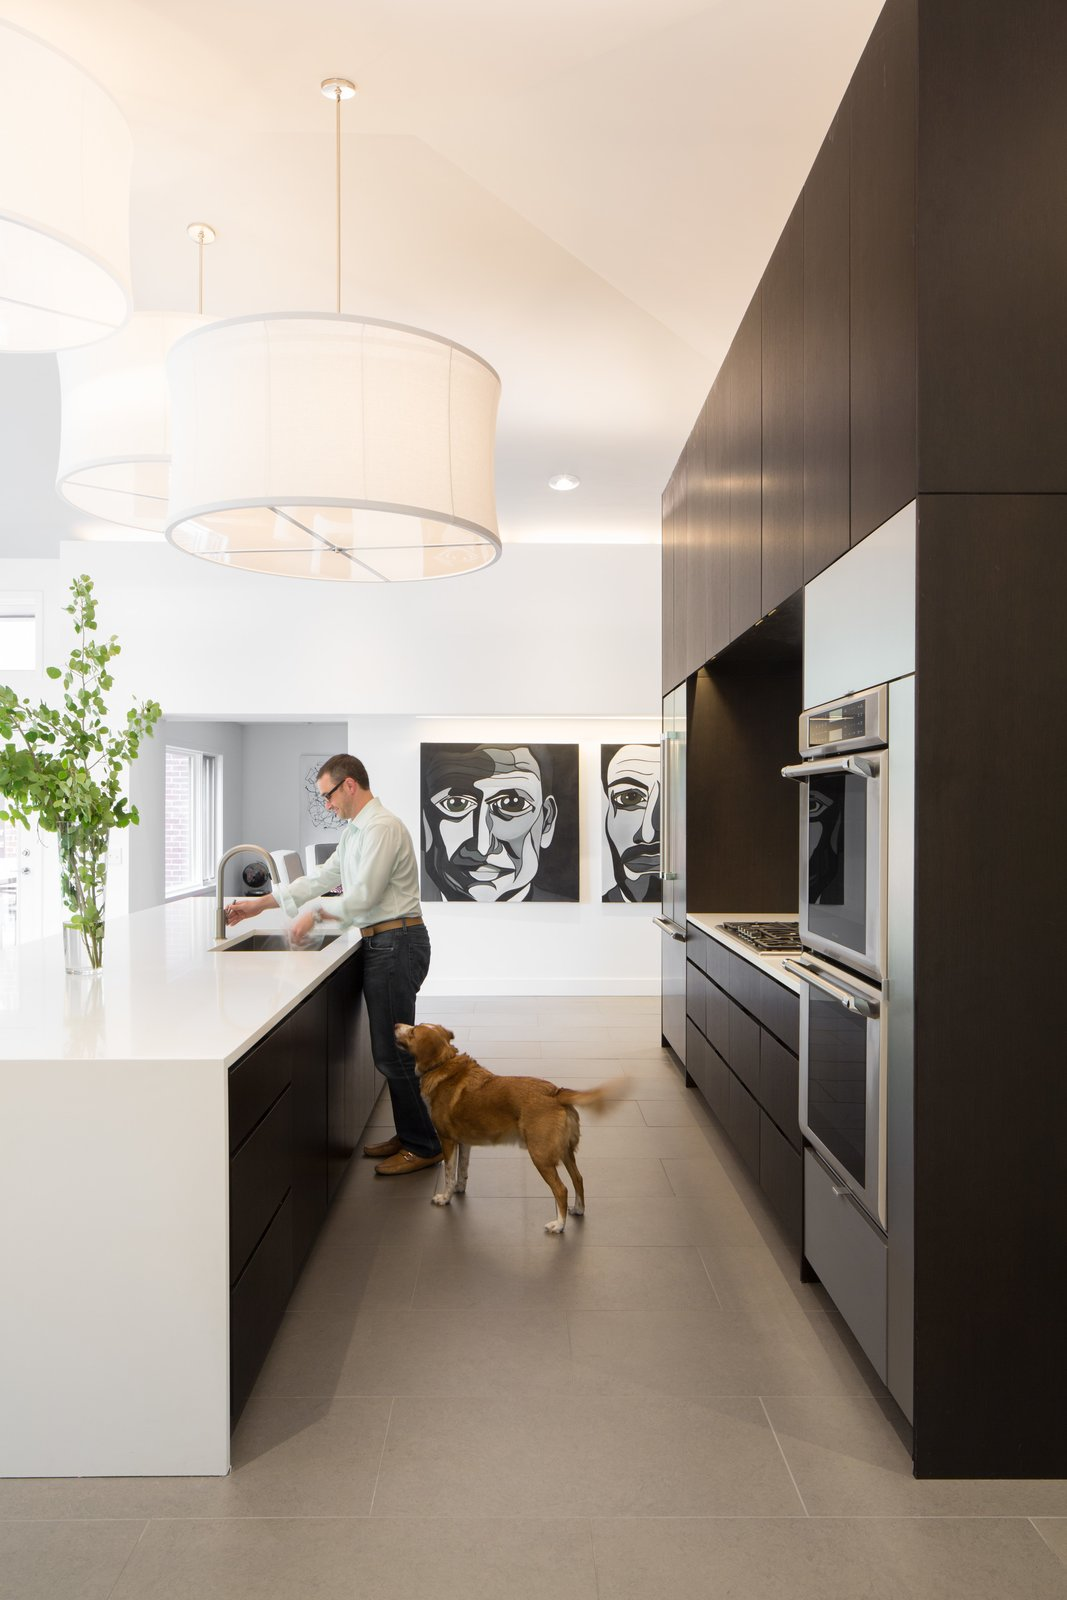 Kitchen, Engineered Quartz Counter, Porcelain Tile Floor, Pendant Lighting, Wood Cabinet, Wall Oven, Refrigerator, and Undermount Sink Kitchen   Donner Residence by Design Platform